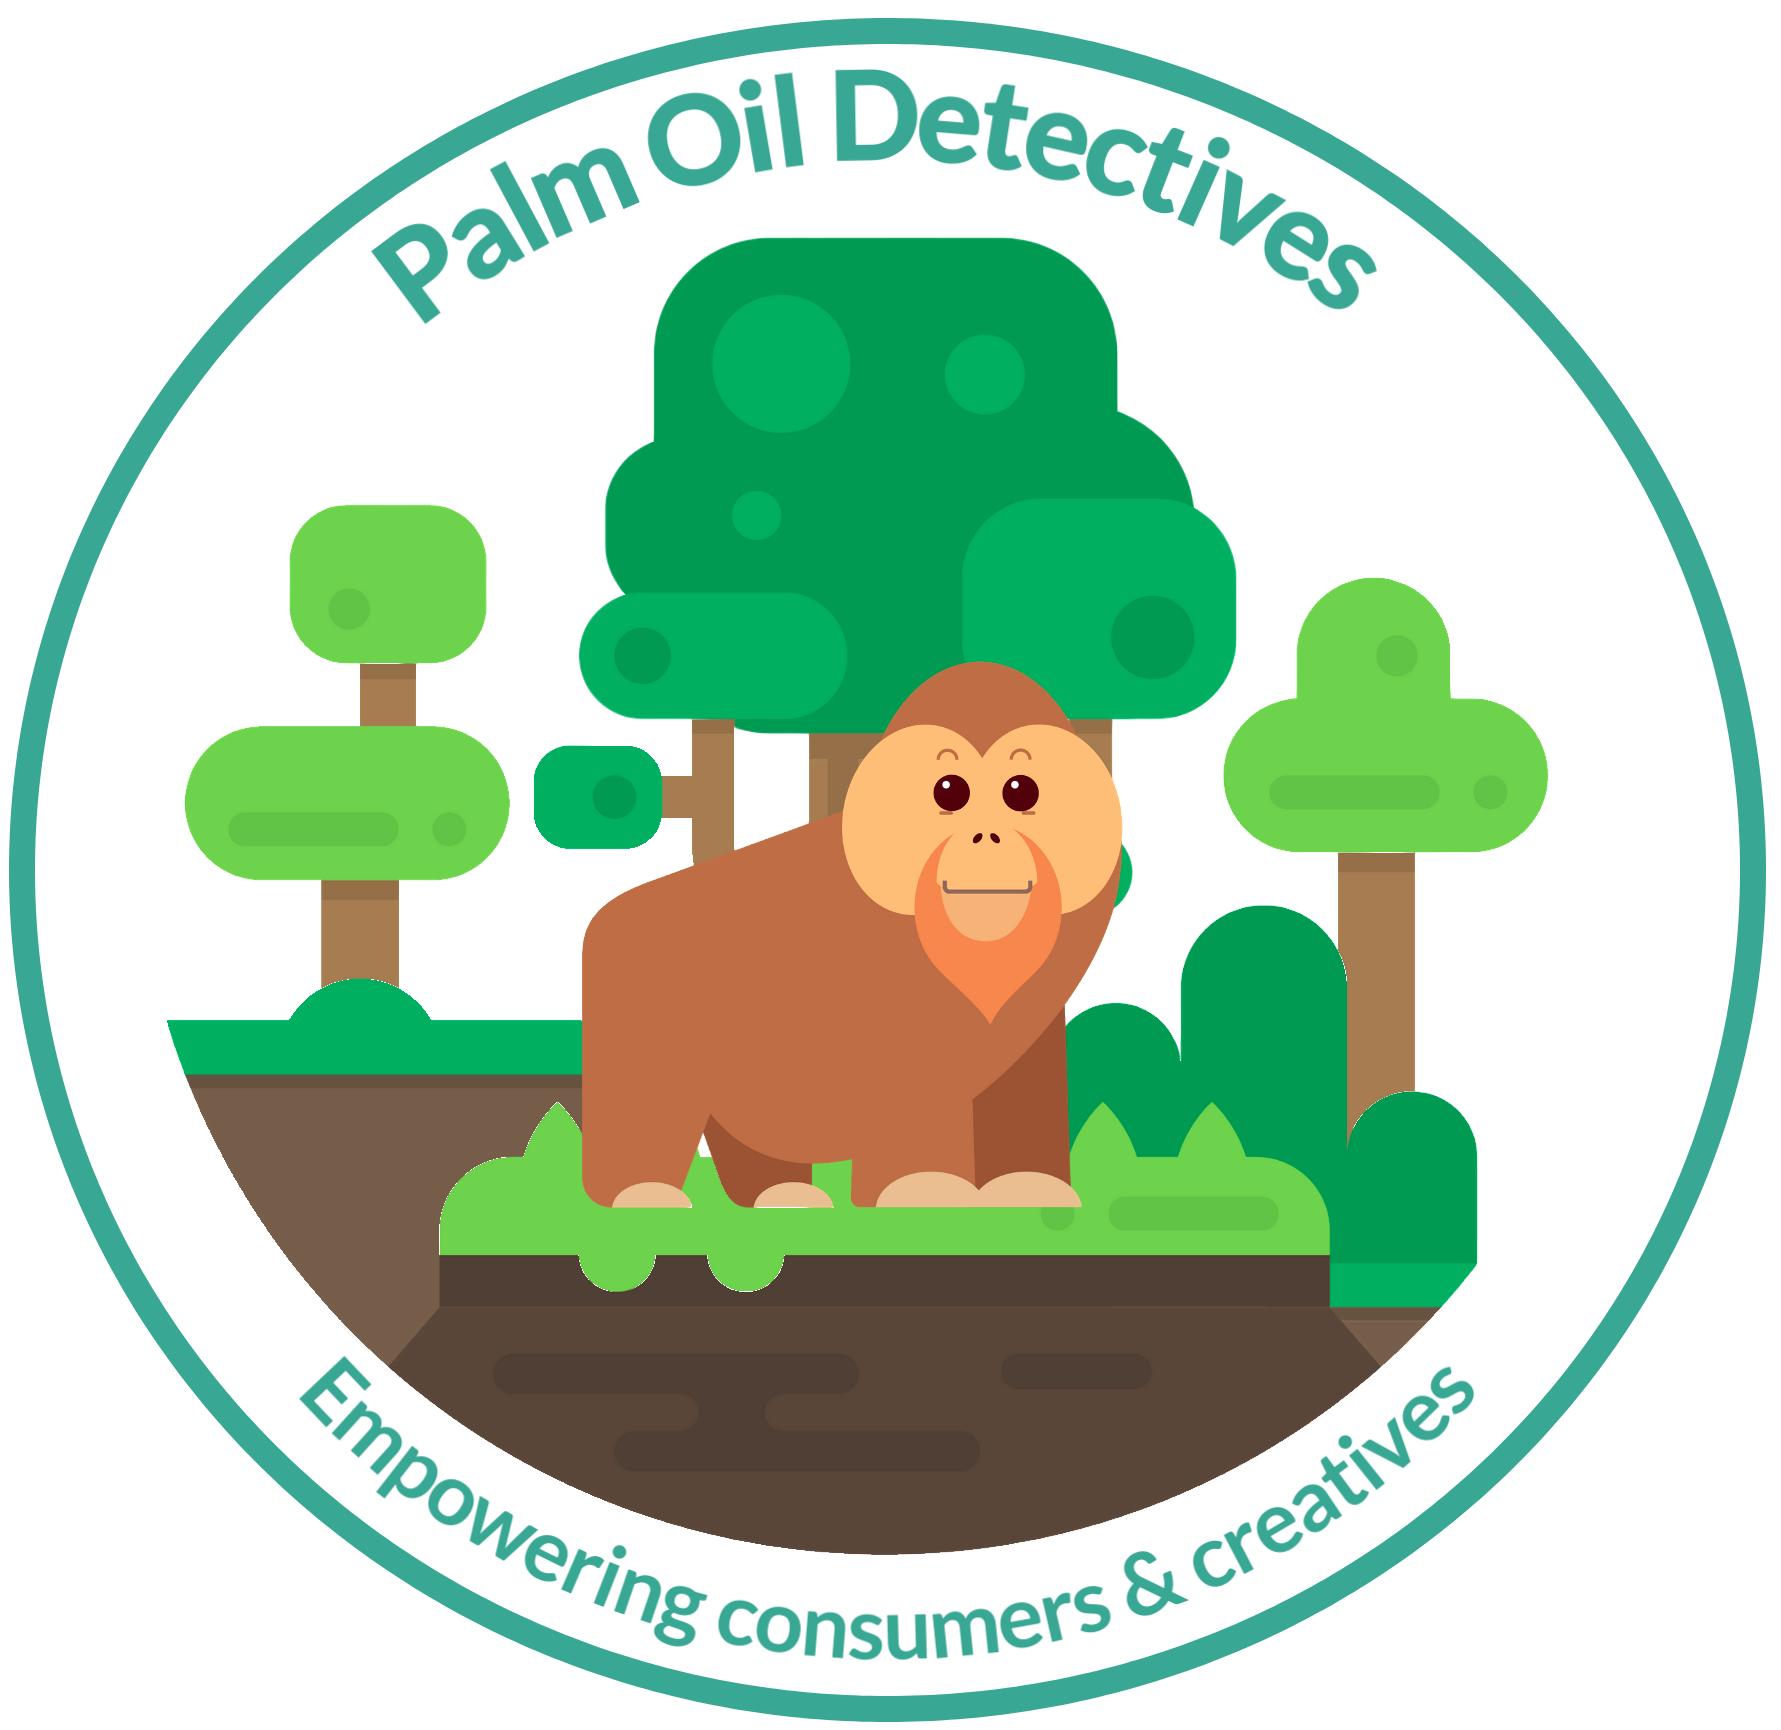 Palm Oil Detectives